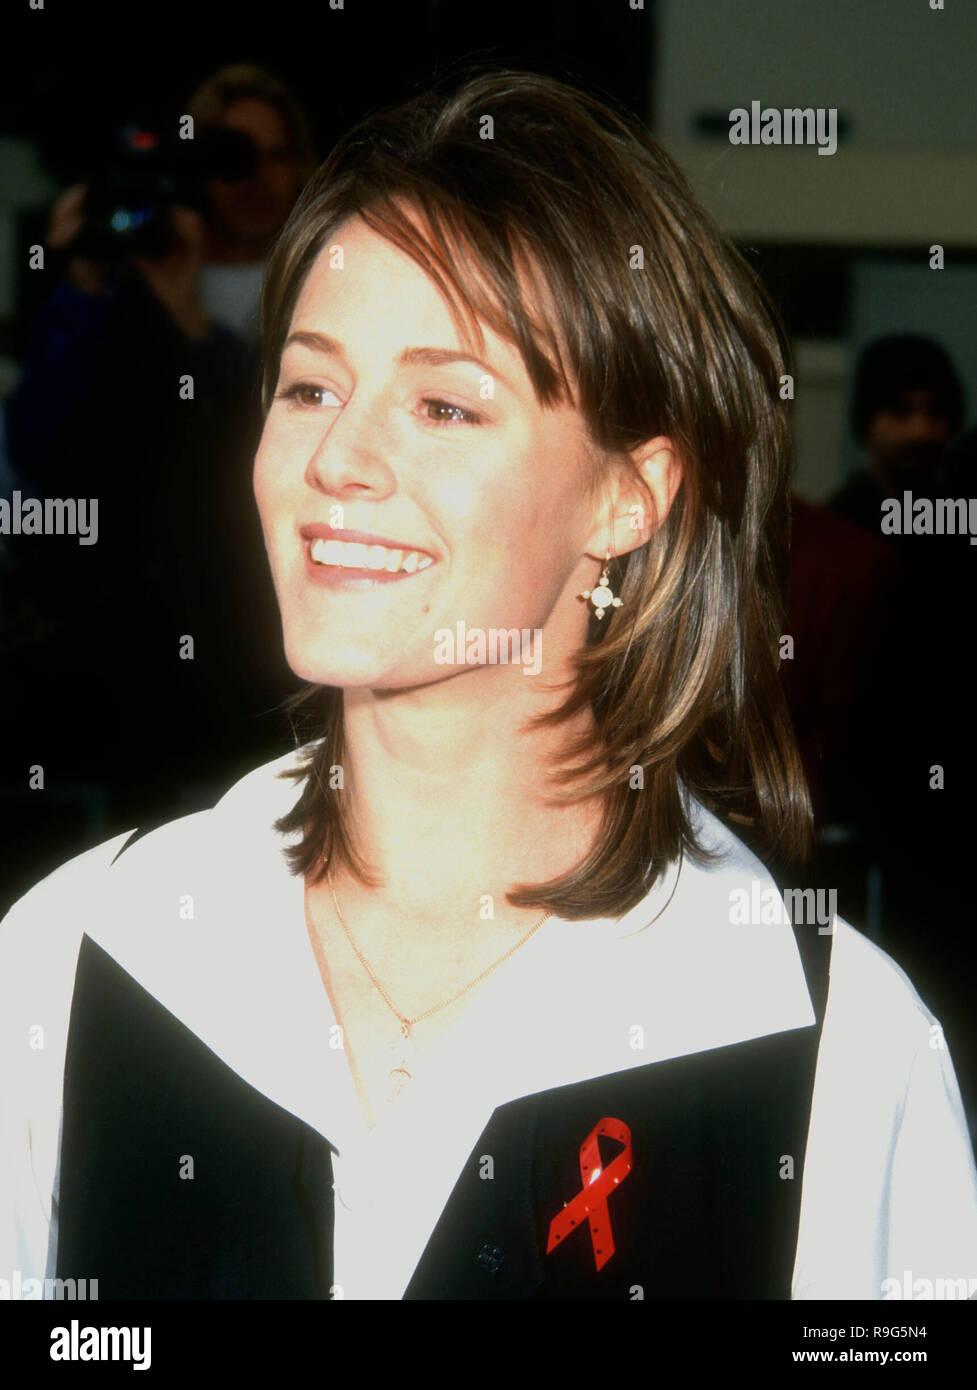 Adelaide Clemens,Rachel Reenstra Adult gallery Agnes Keleti 10 Olympic medals,Sybil Danning